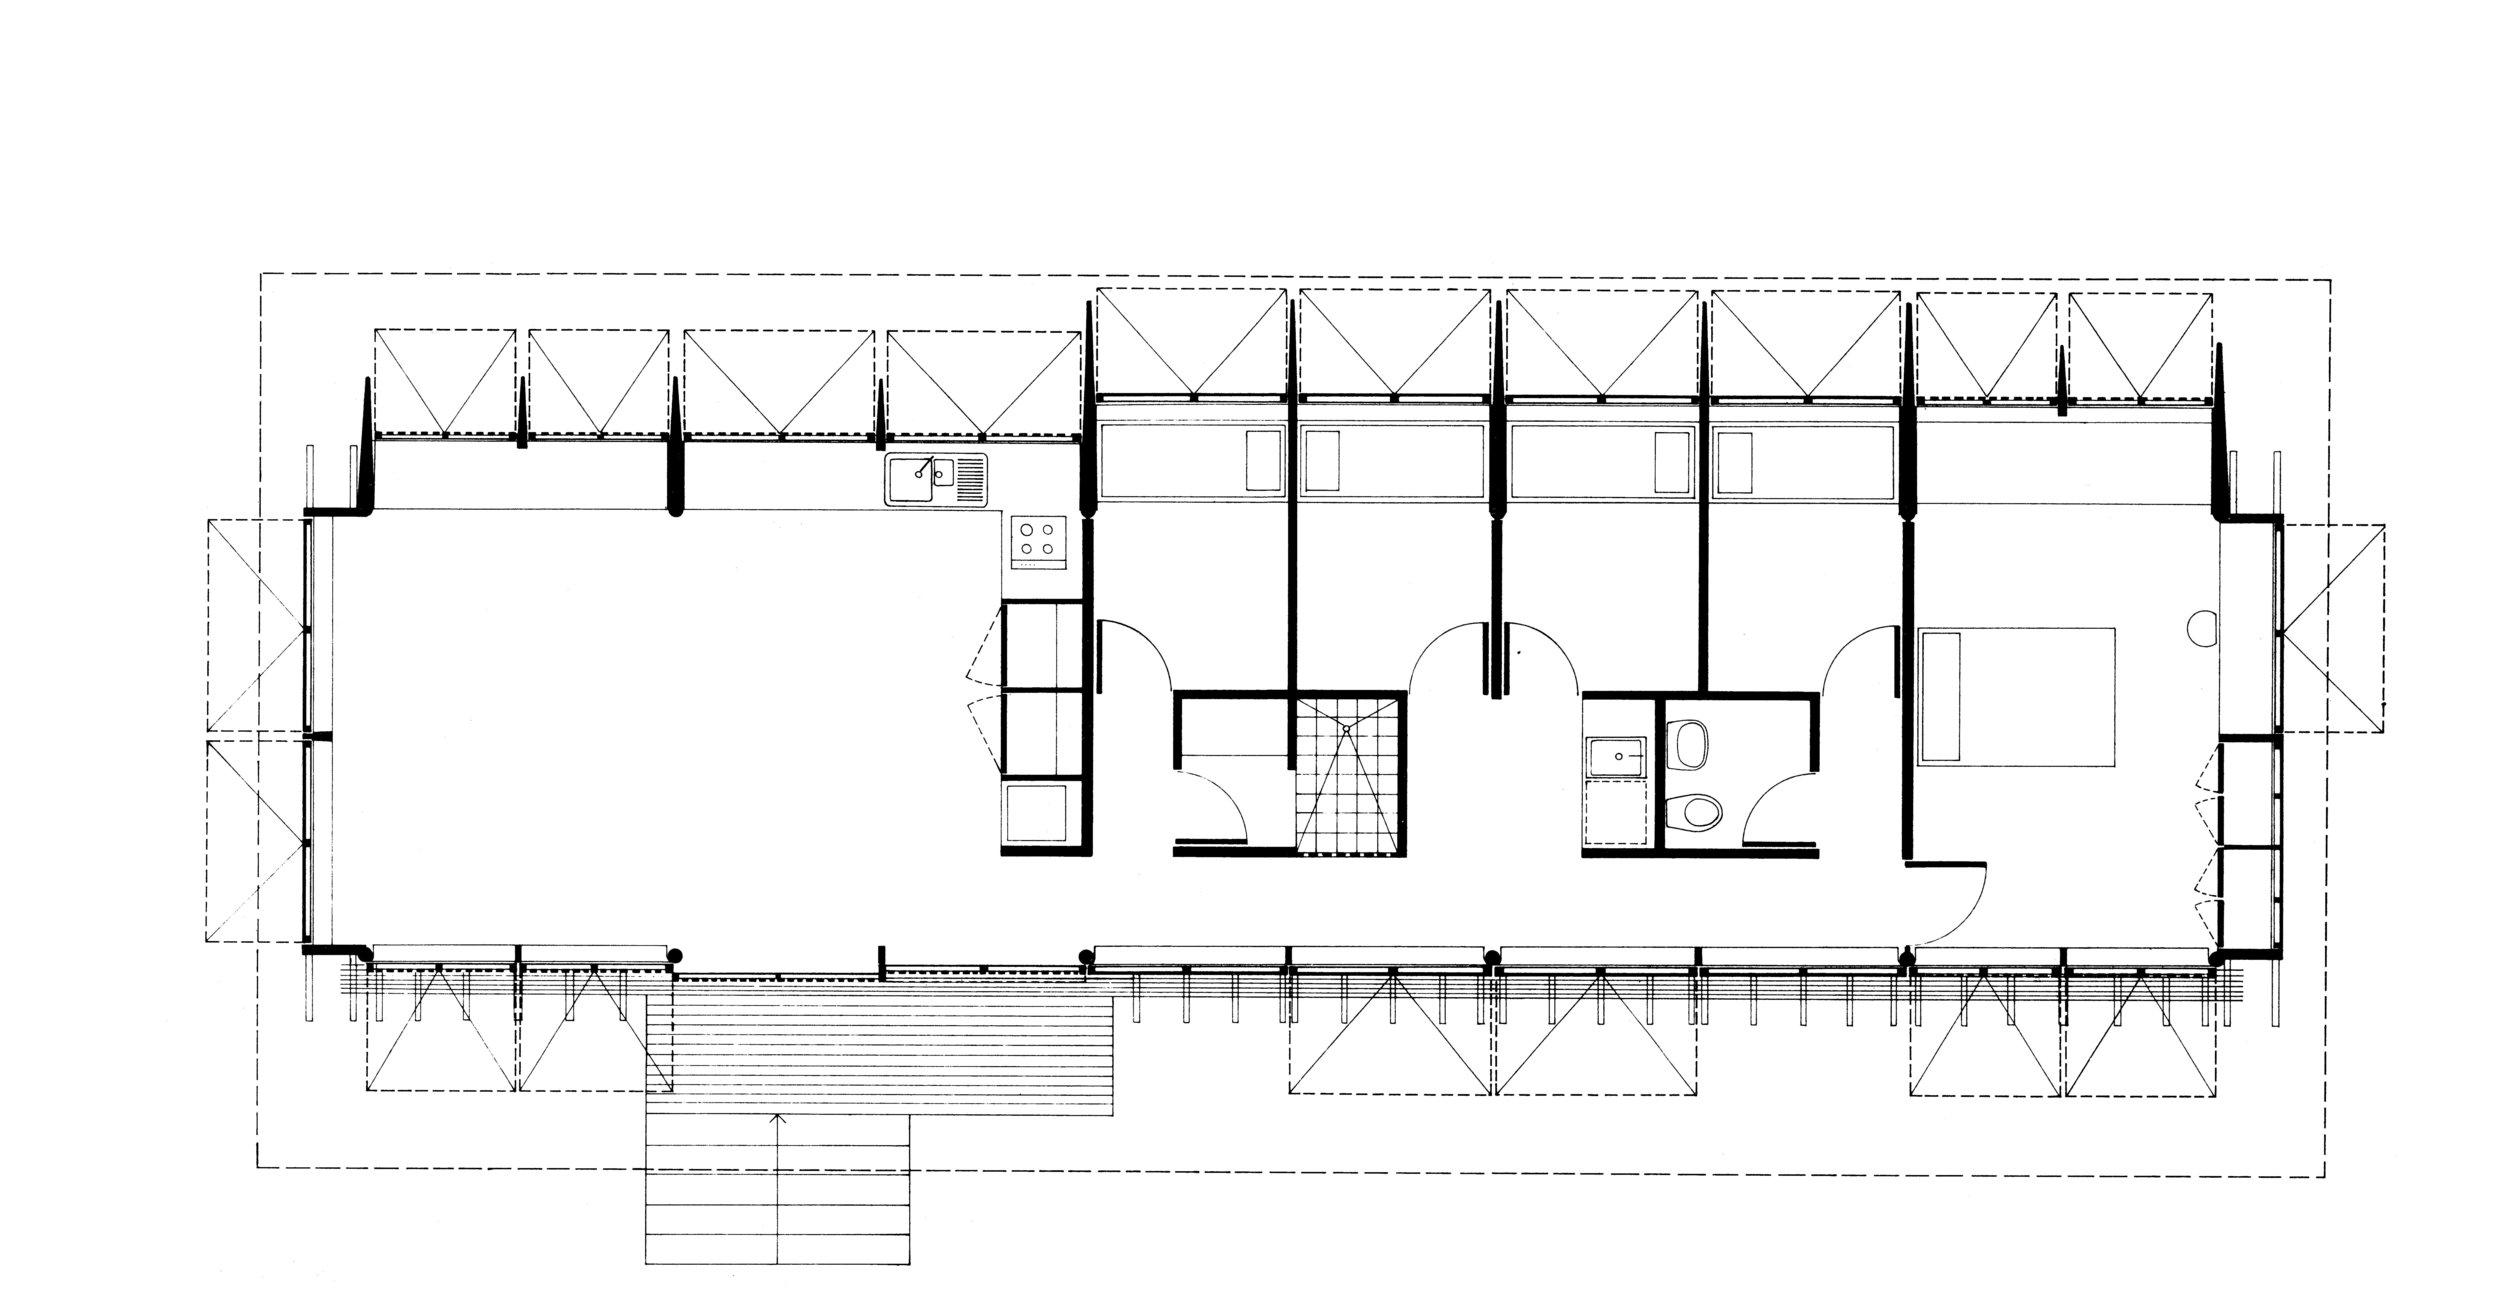 Marika-Alderton House - Sheet2